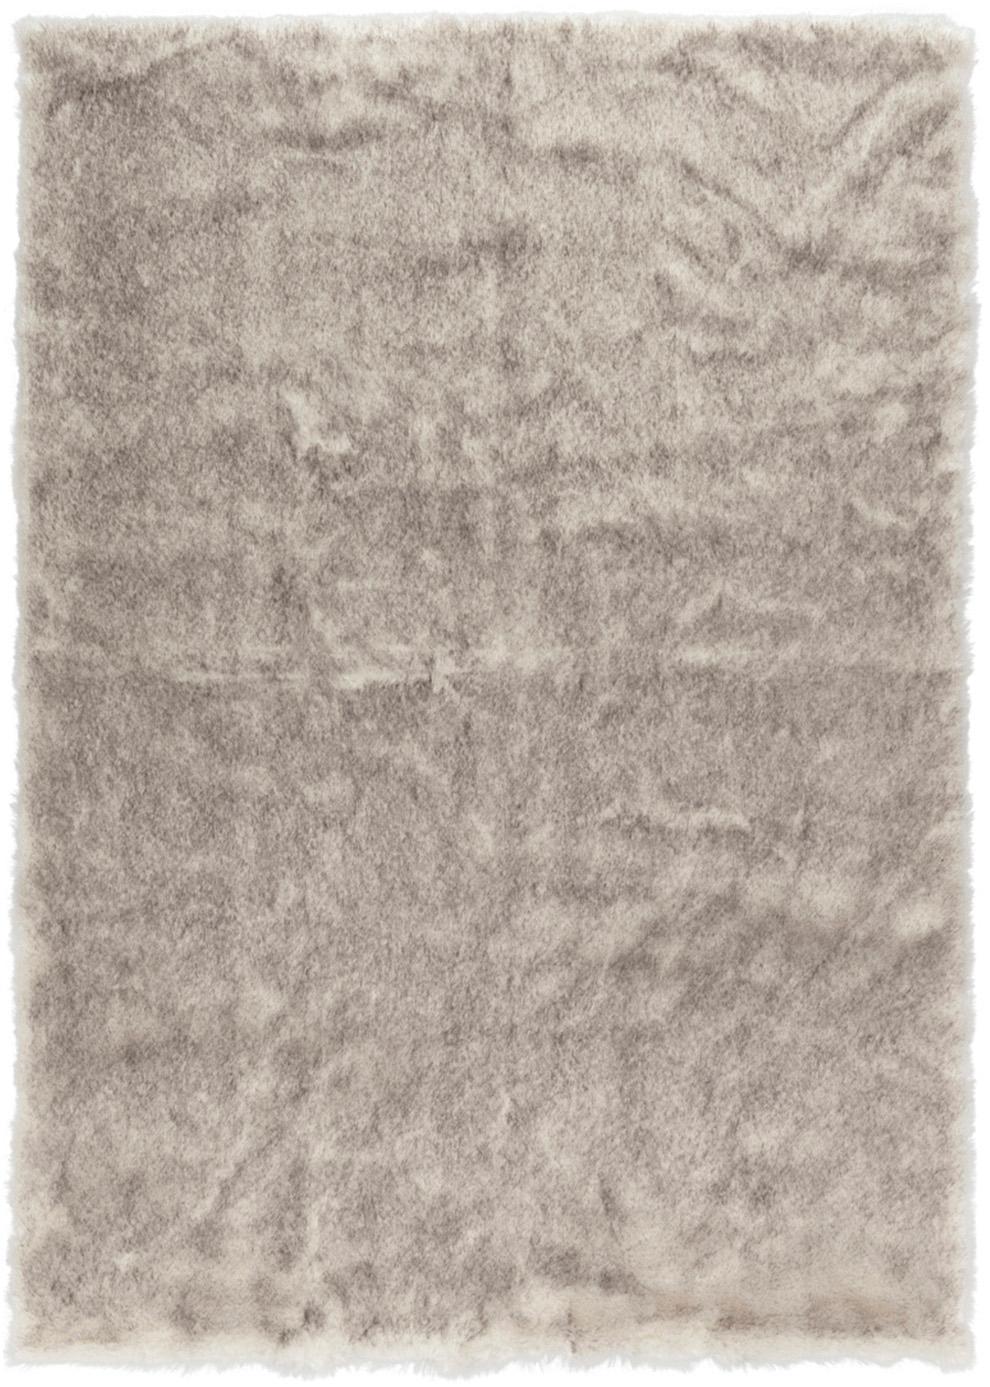 Flauschiger Hochflor-Teppich Superior aus Kunstfell, Flor: 95% Acryl, 5% Polyester, Creme,Beige,Weiss, B 160 x L 230 cm (Grösse M)